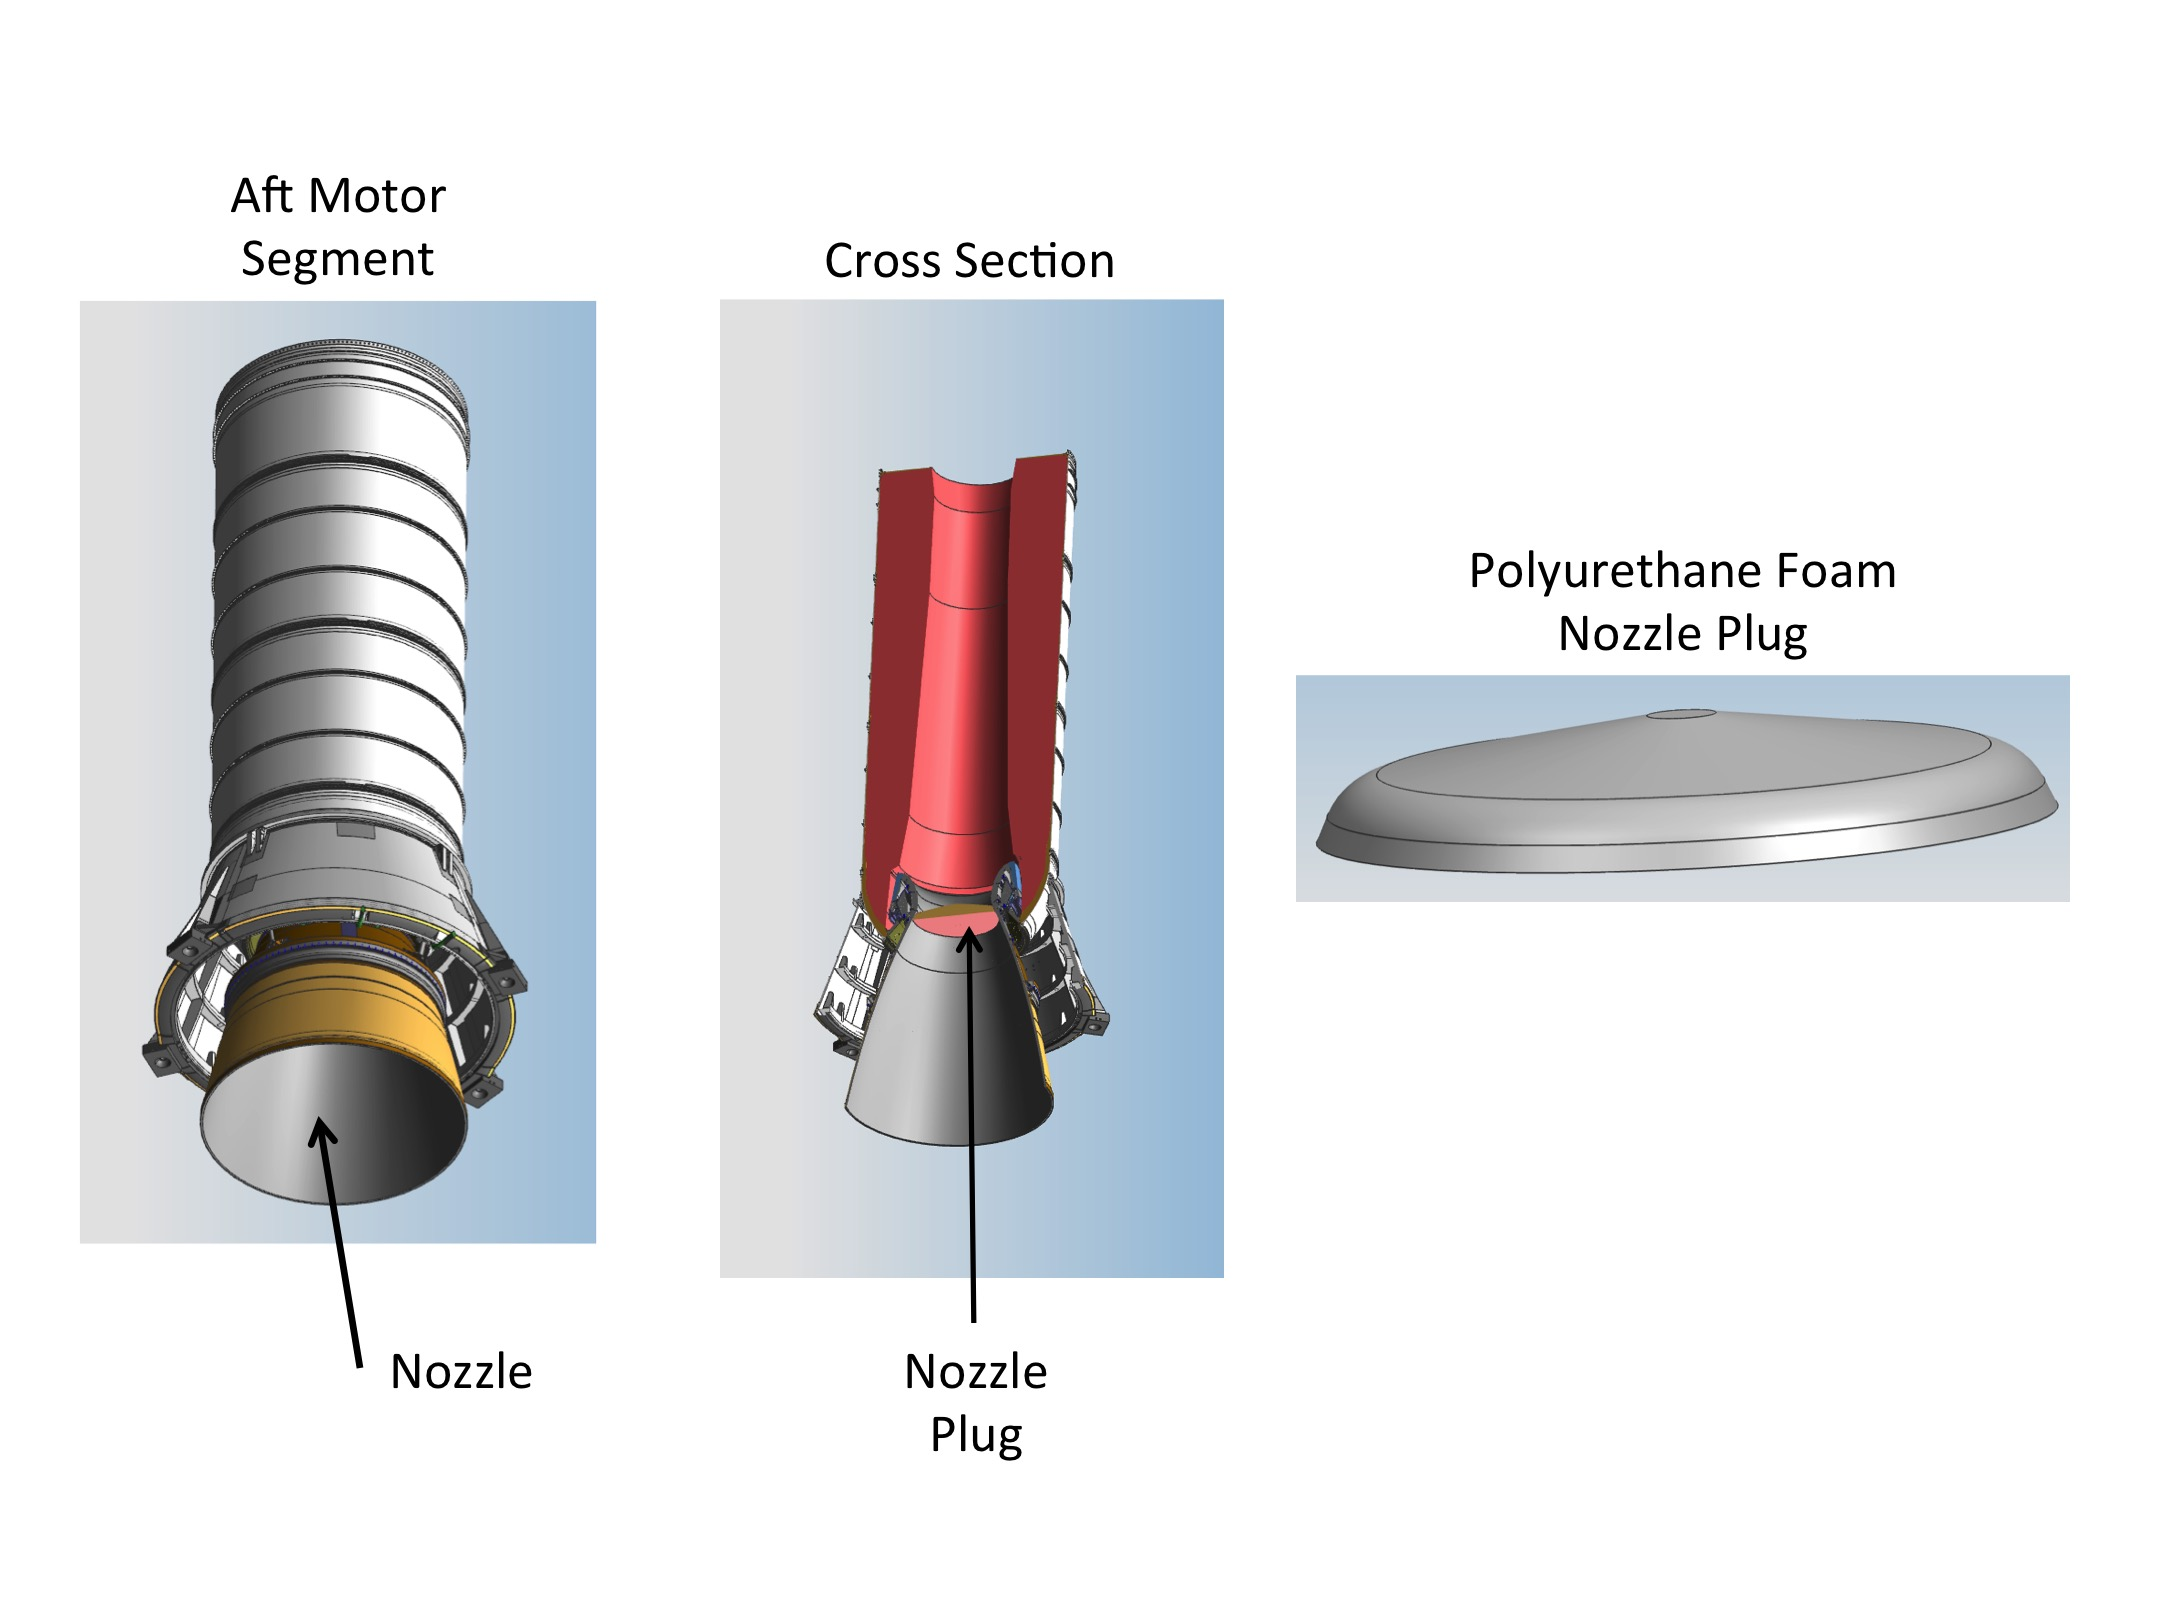 General Plastics Polyurethane Foam Fills Key Role In Ground Test Of Diagram A Model Rocket Engine Worlds Largest Solid Motor